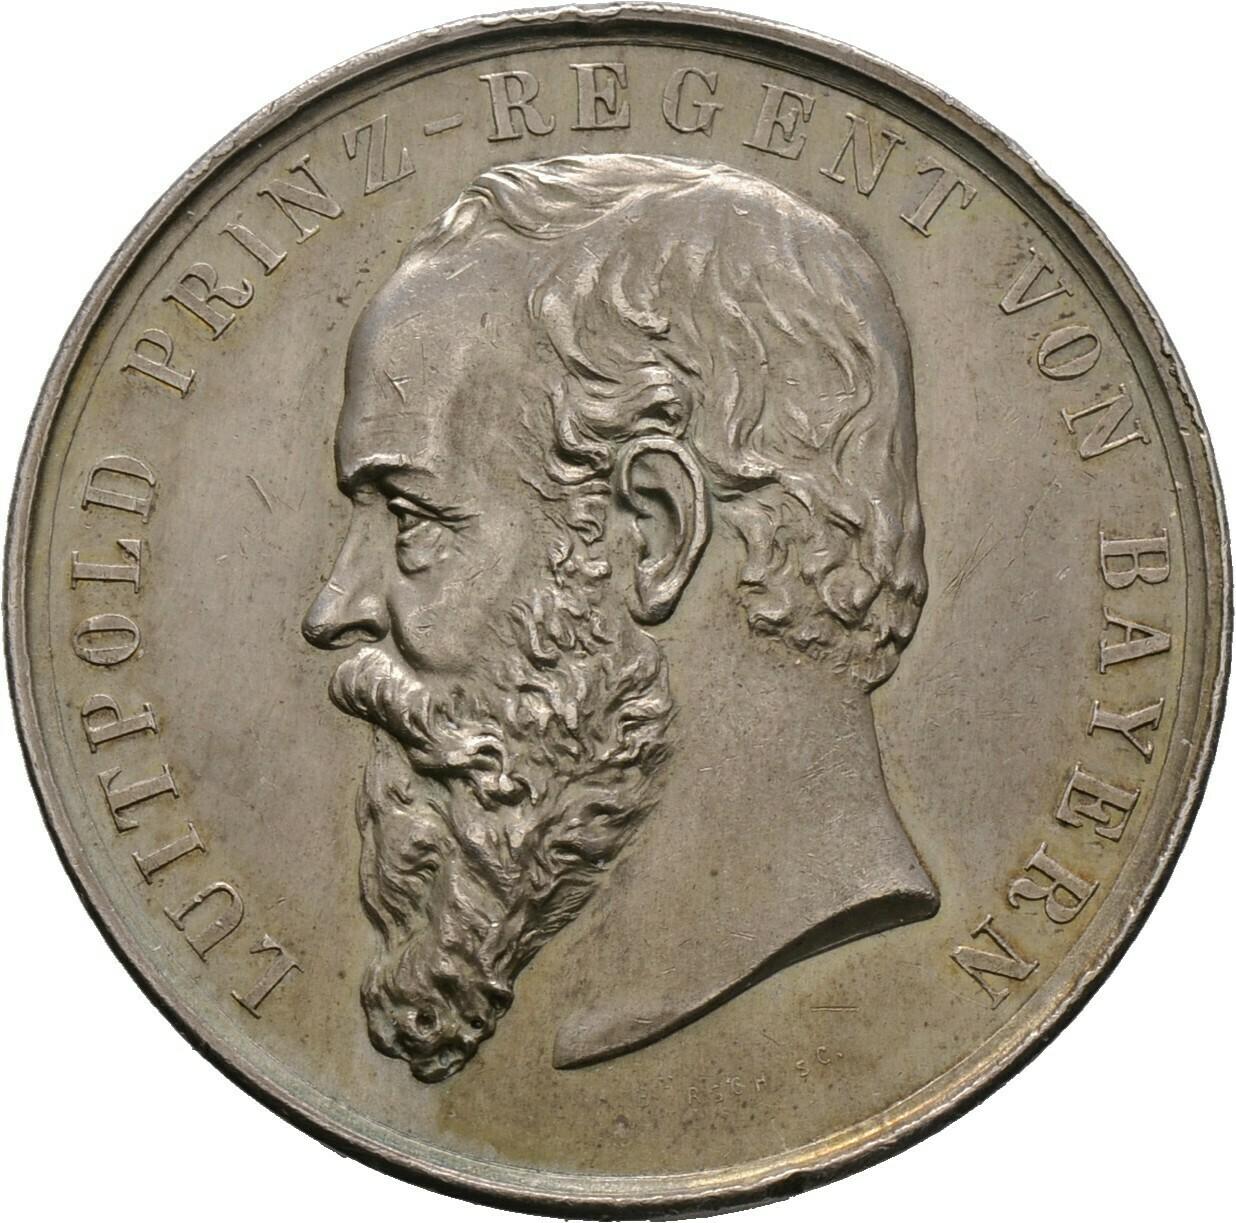 Silberne Prämienmedaille o.J., Luitpold, Bayern